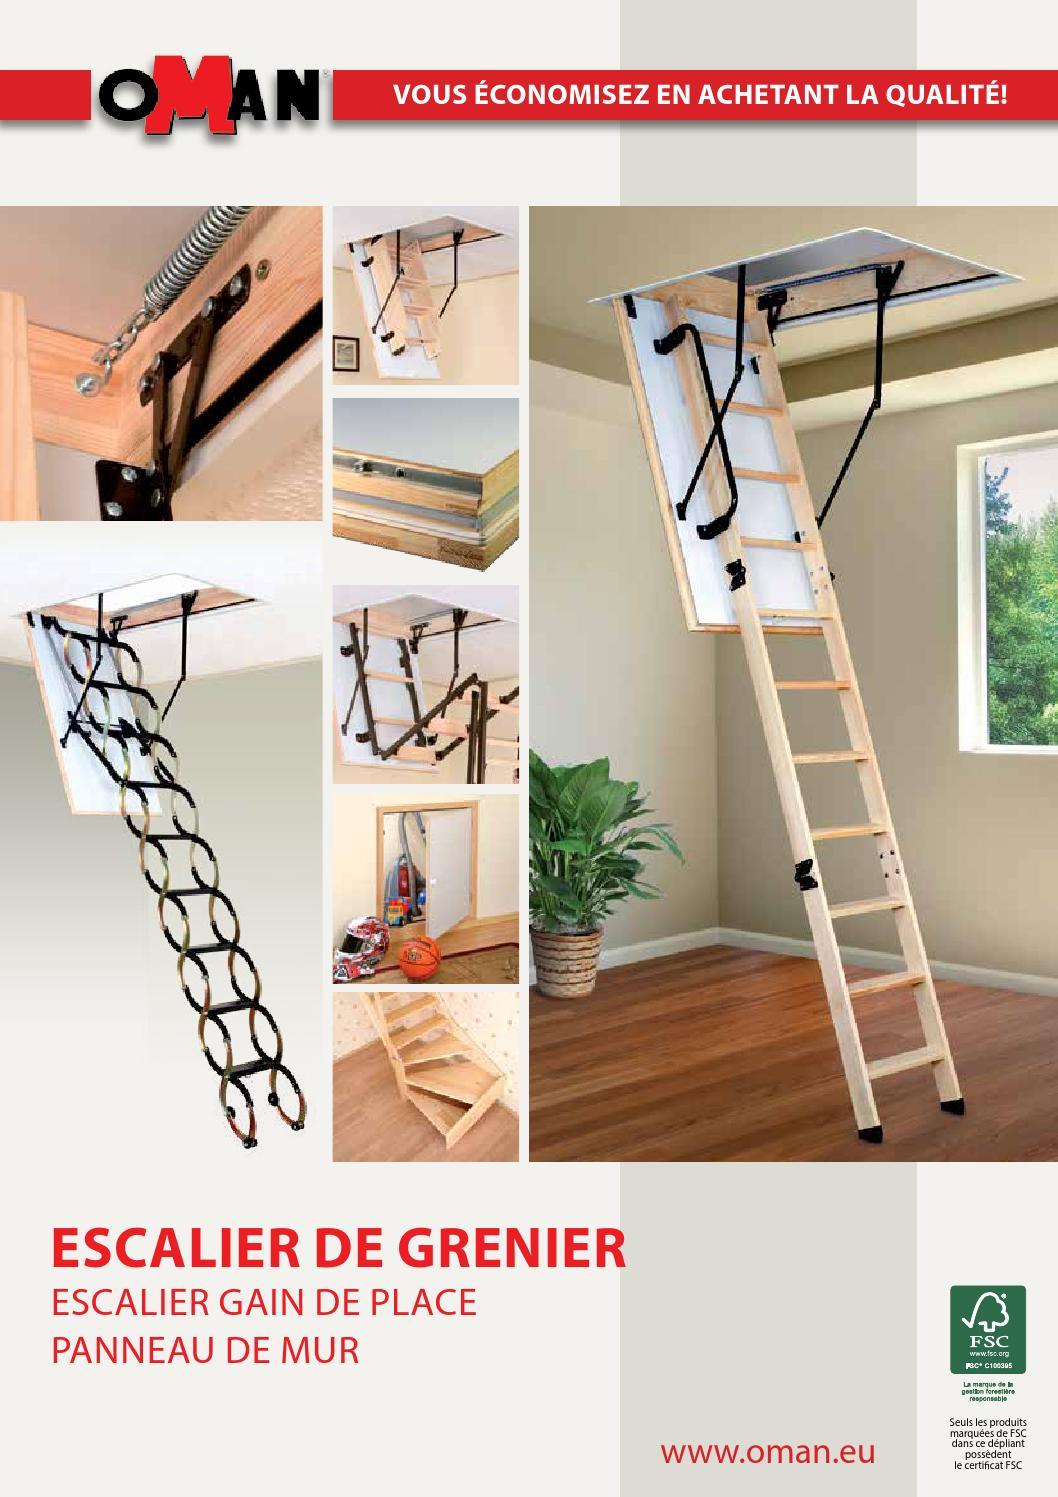 escalier de grenier by oman issuu. Black Bedroom Furniture Sets. Home Design Ideas